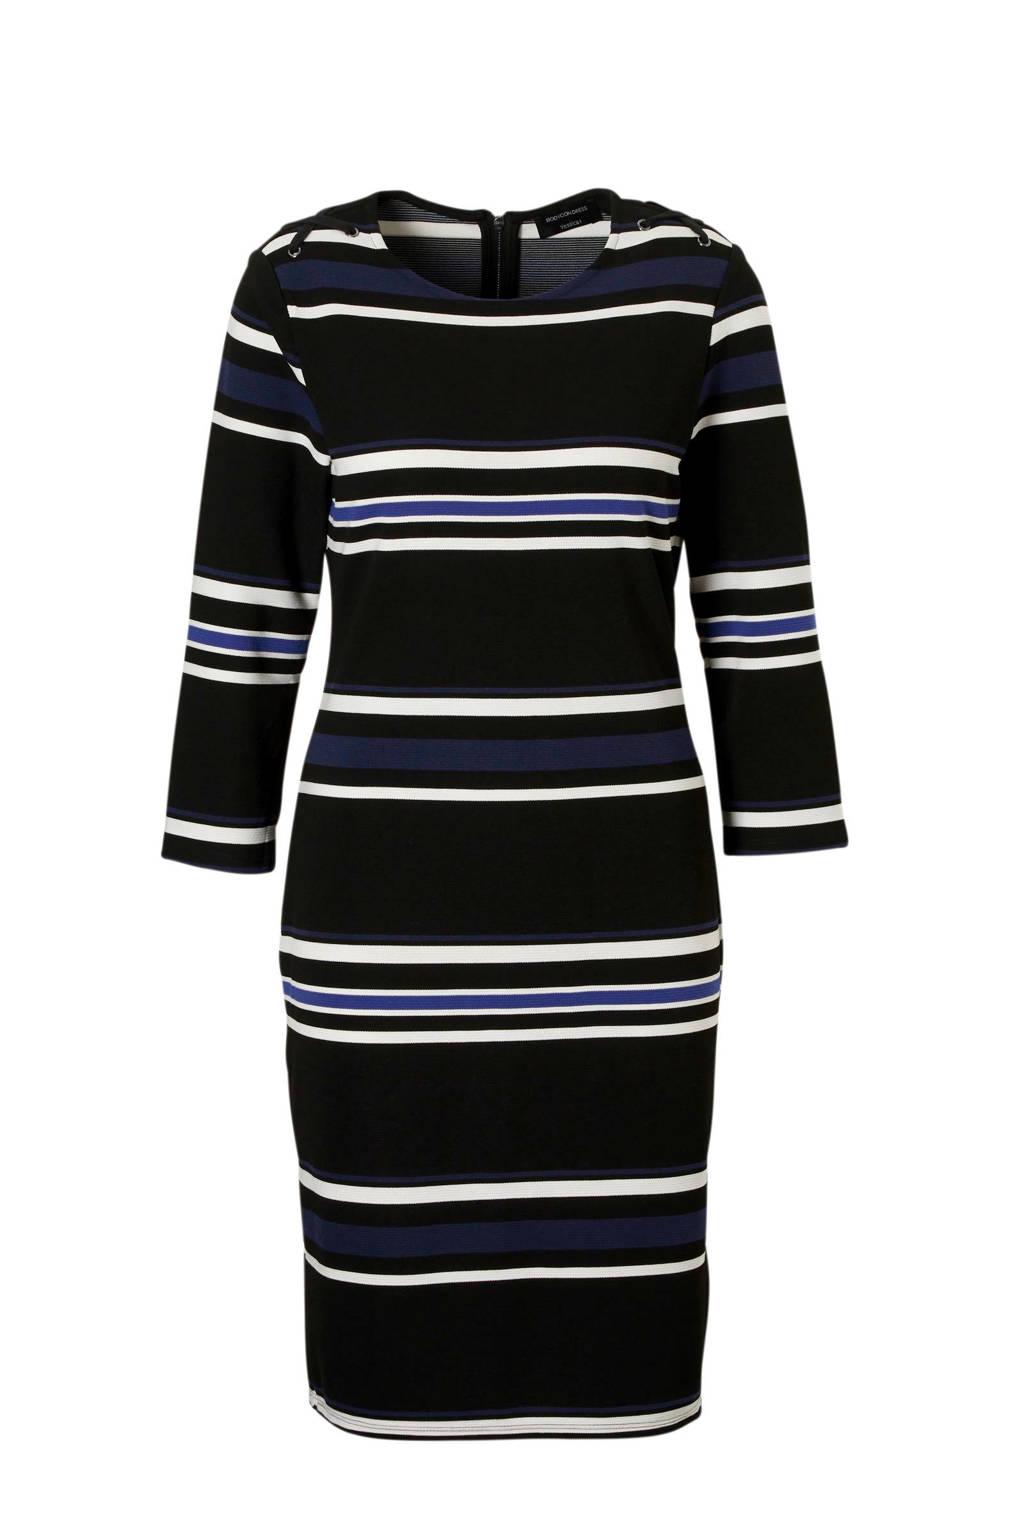 C&A Yessica jurk met sier veters zwart, Zwart/ blauw/ wit